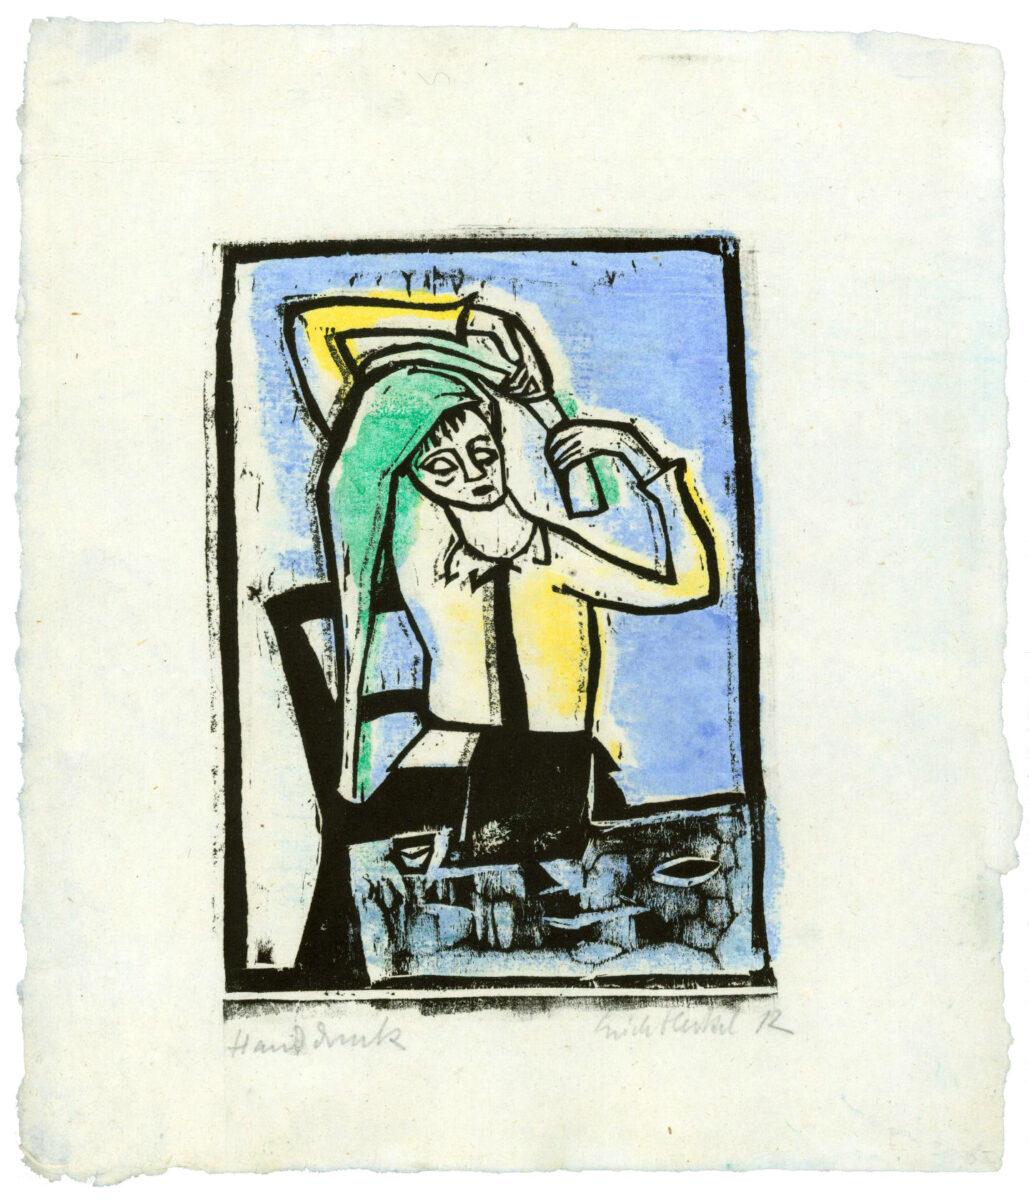 Erich Heckel Vor dem Spiegel (in front of mirror) original woodcut with hand colouring